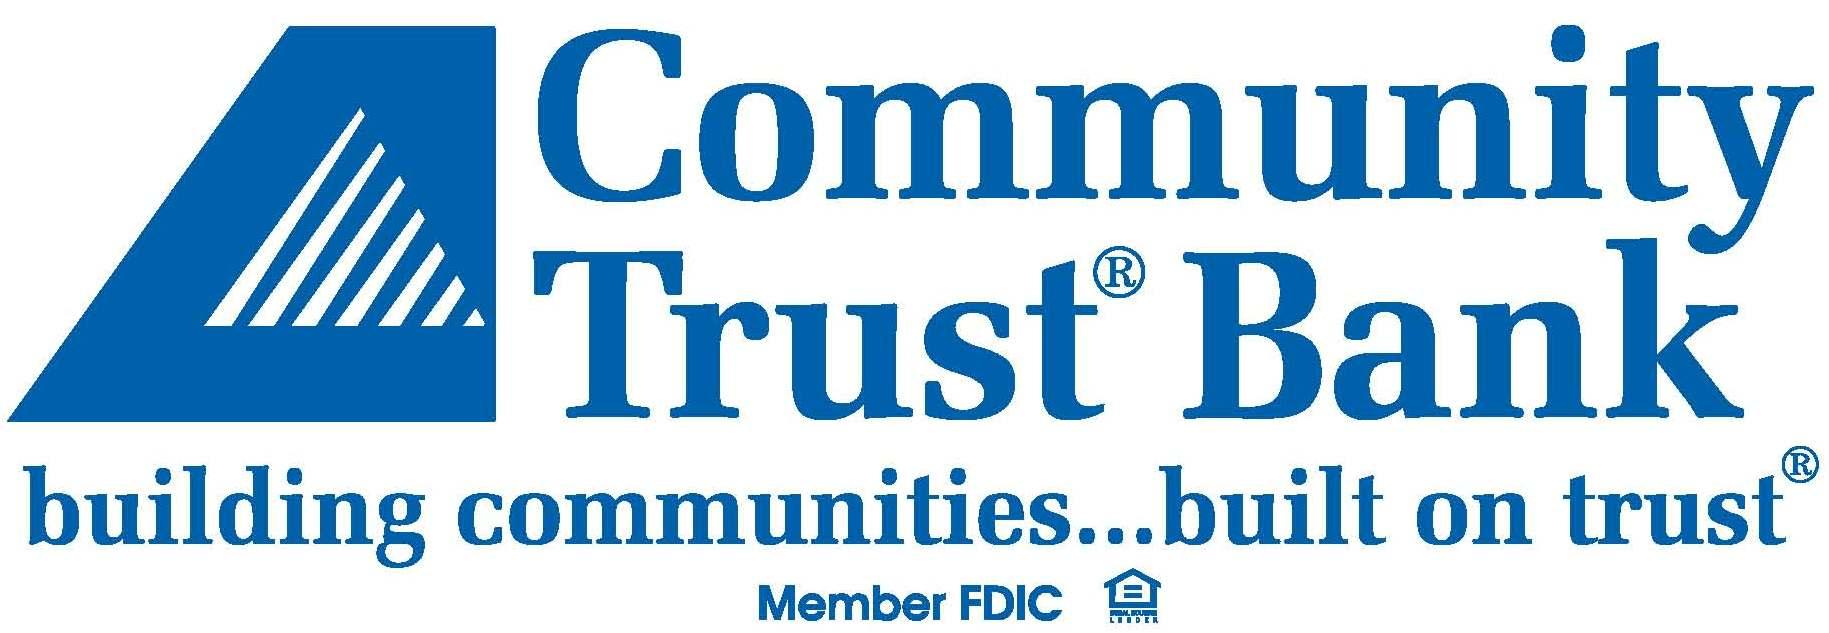 Community Trust Bank Logo.jpg